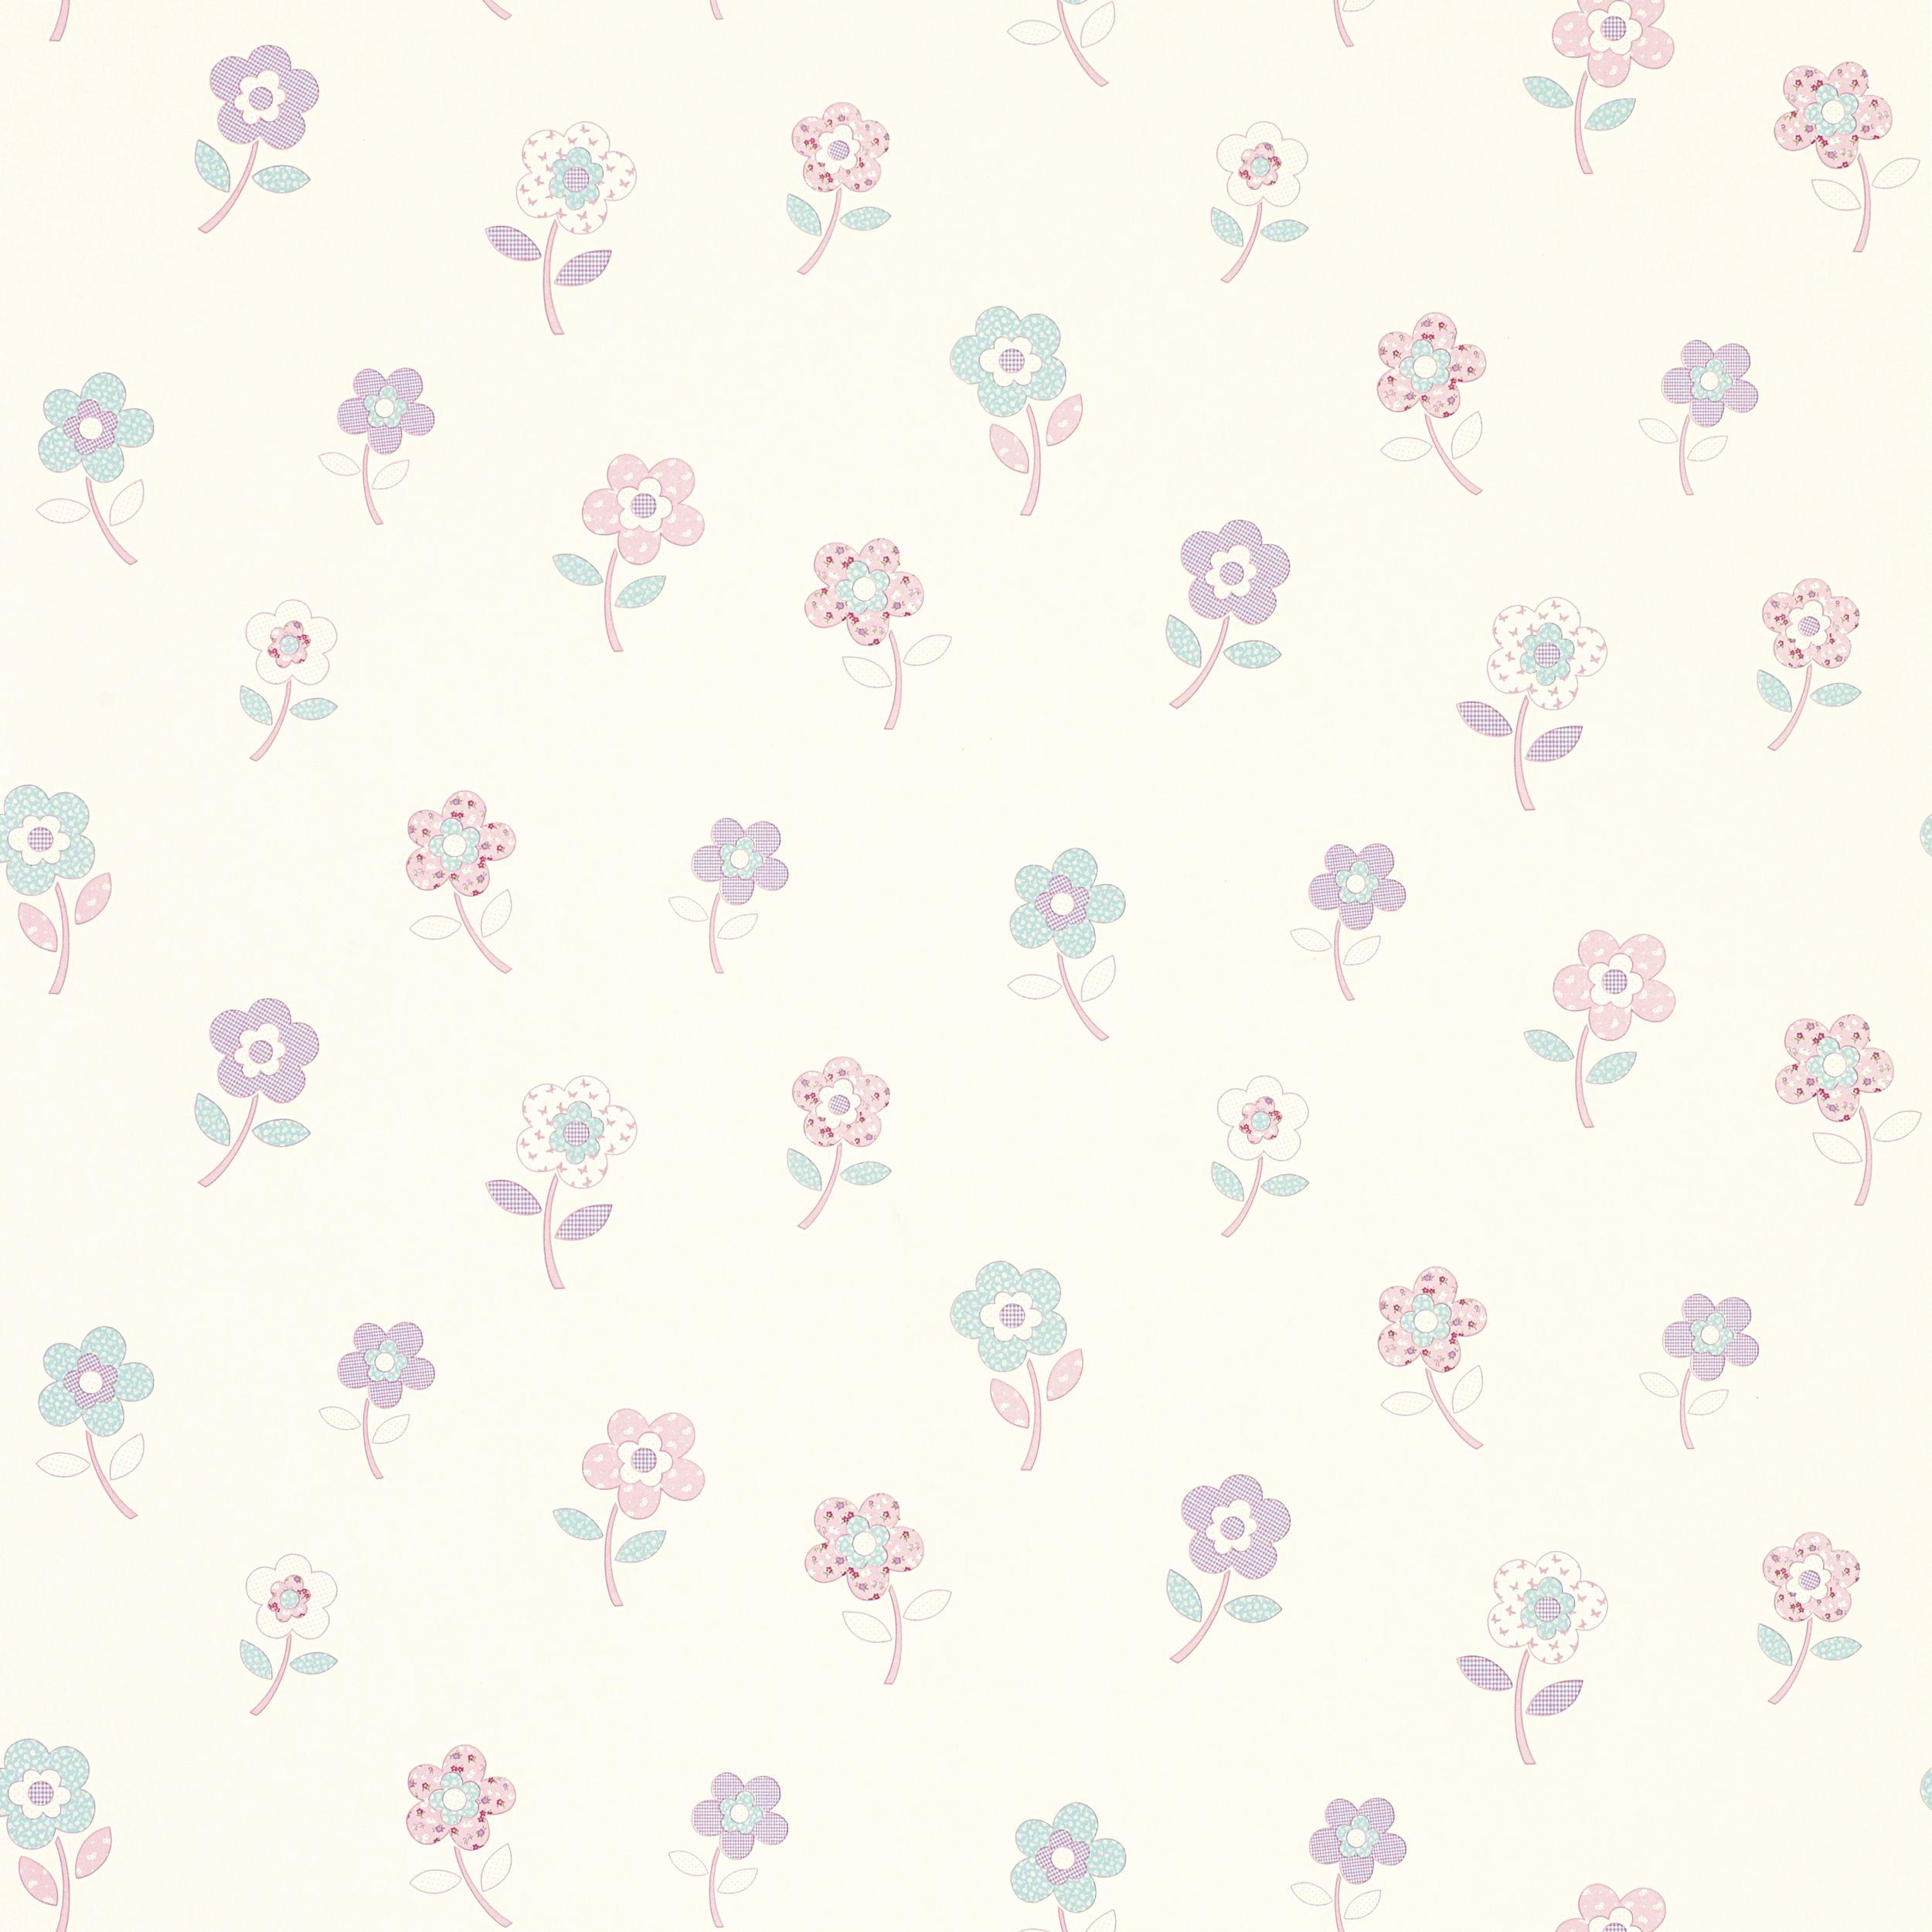 Clementine flower childrens wallpaper from laura ashley for Childrens wallpaper